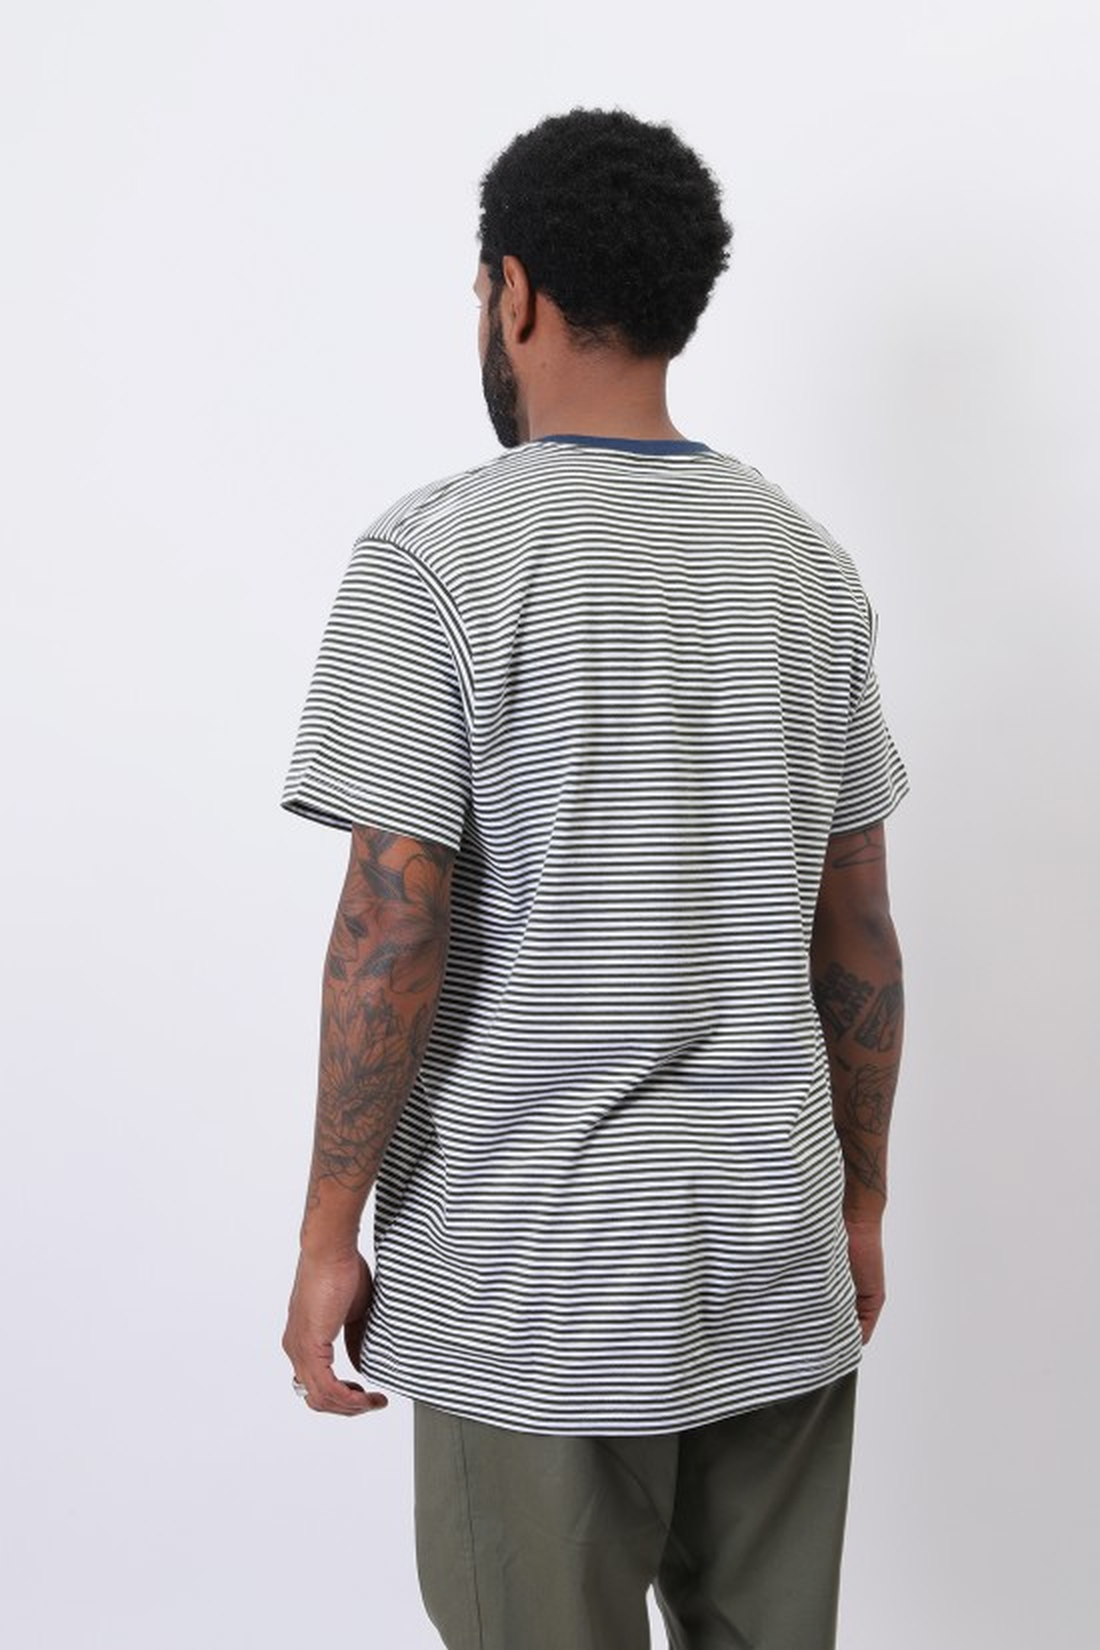 PATTA / City knitted stripe tshirt White rifle green